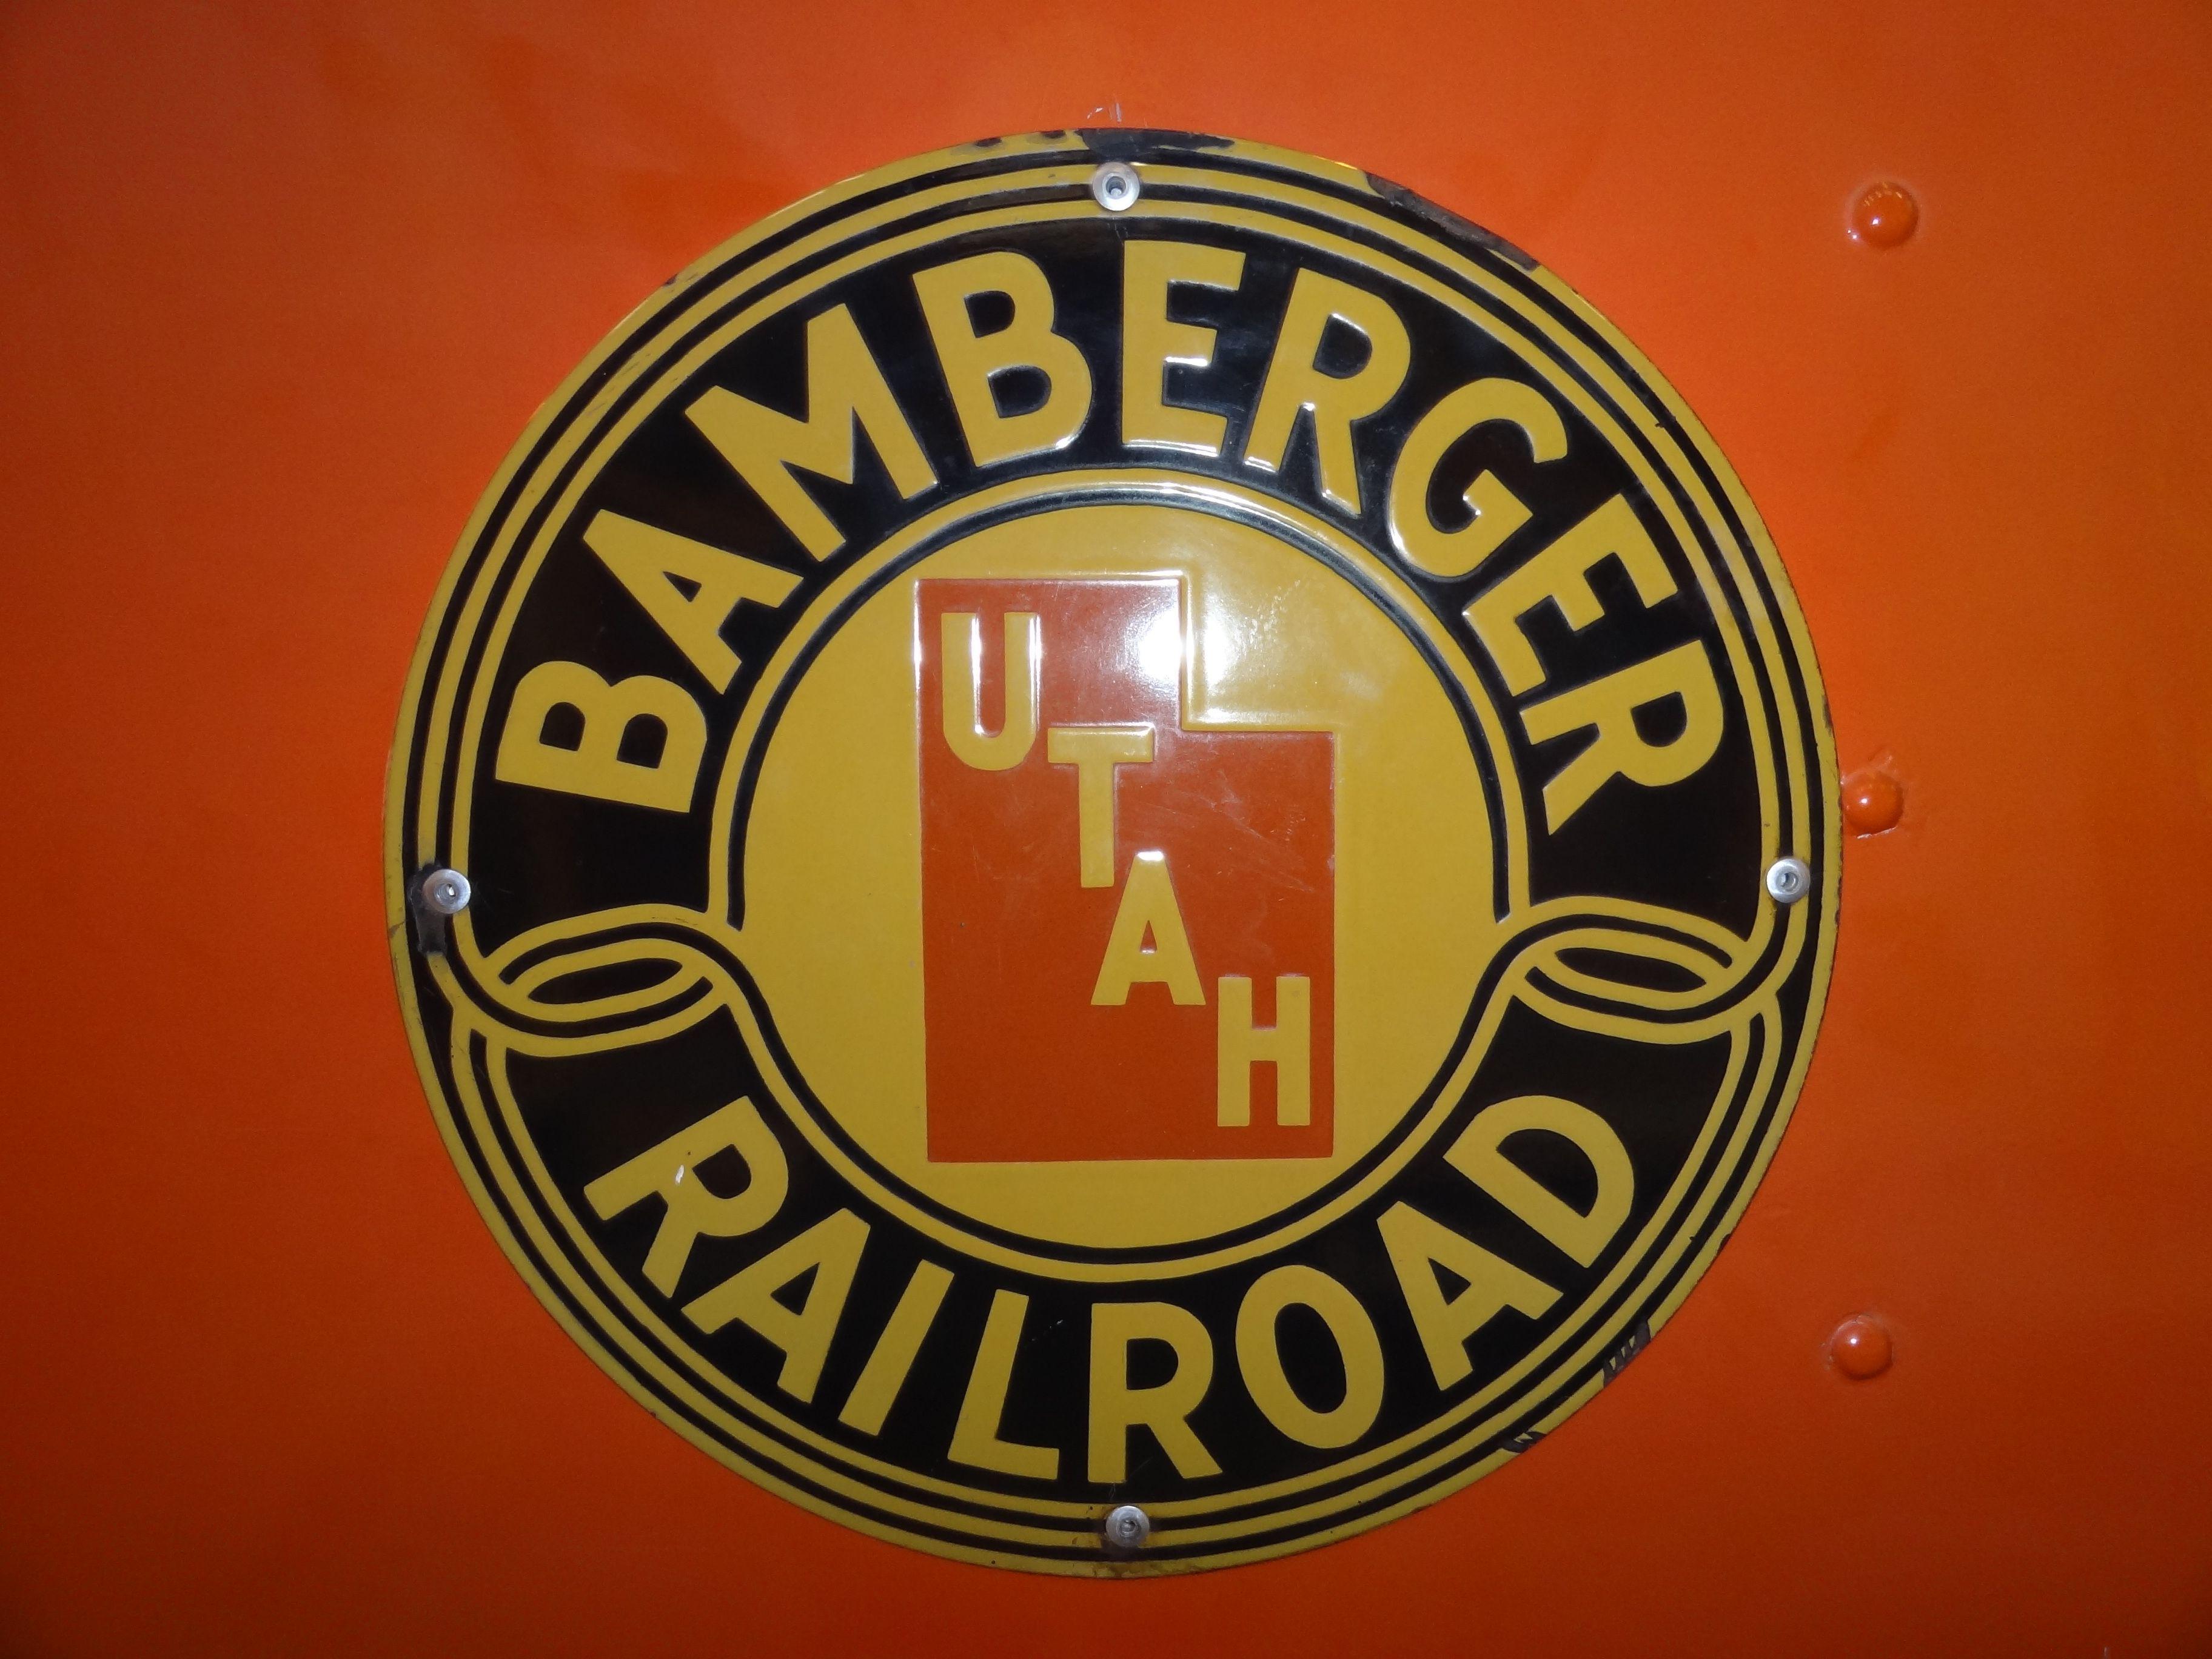 Bamberger Railroad Logo Train rides, Train posters, Railroad